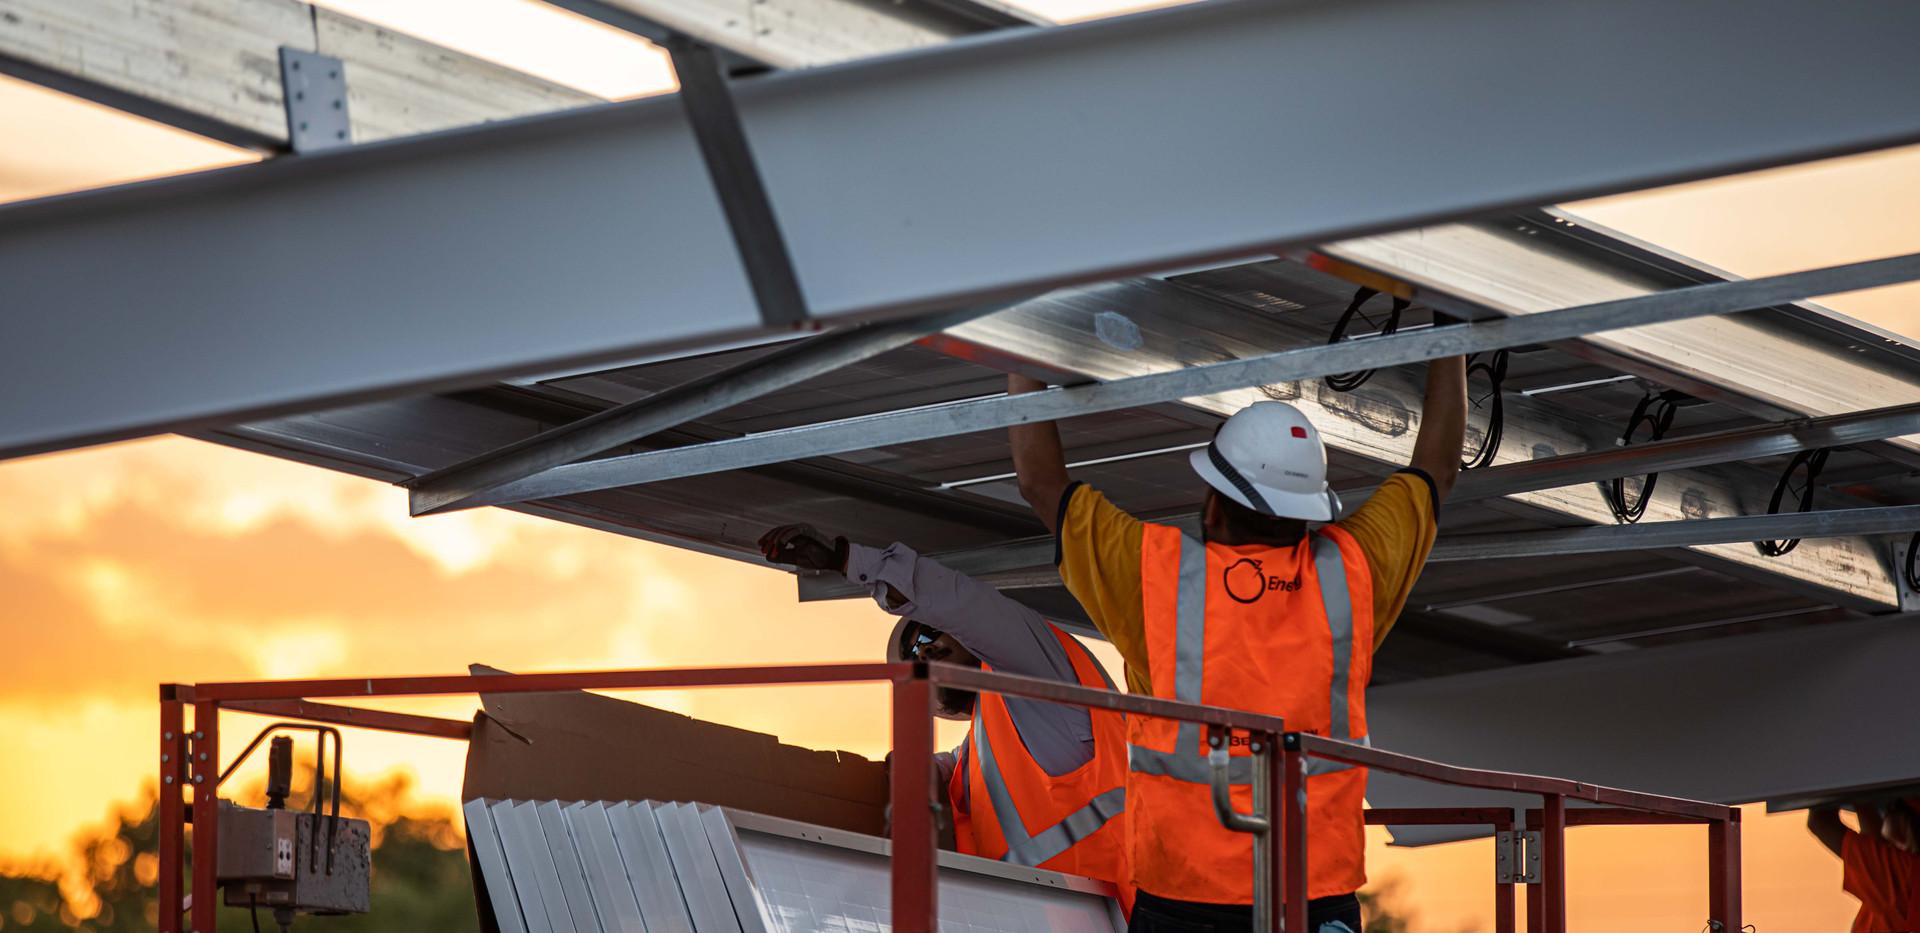 Go Smart Solar | Big Sun Community Solar - White Cloud Drones